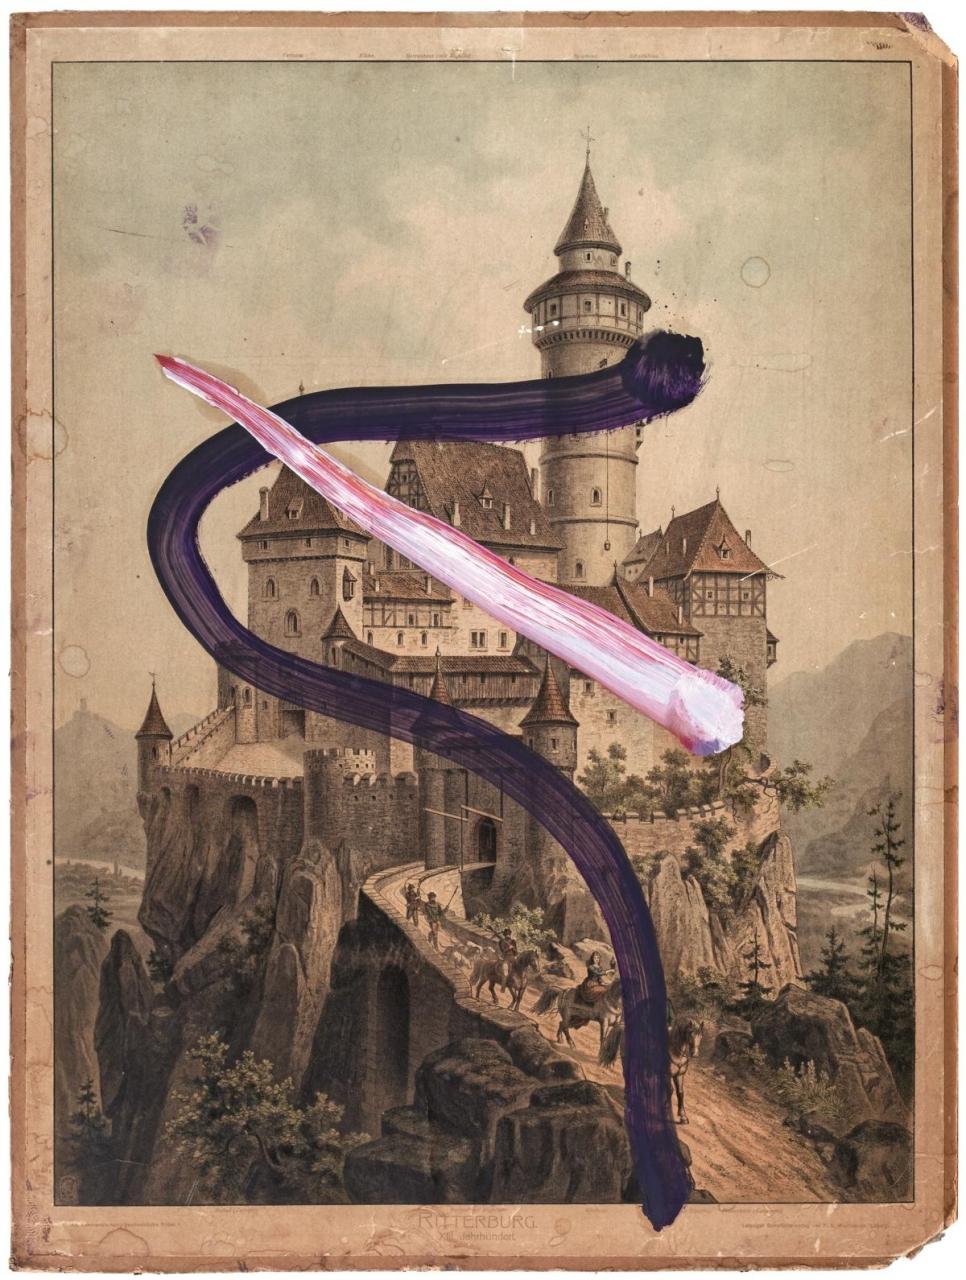 Untitled (Ritterburg)